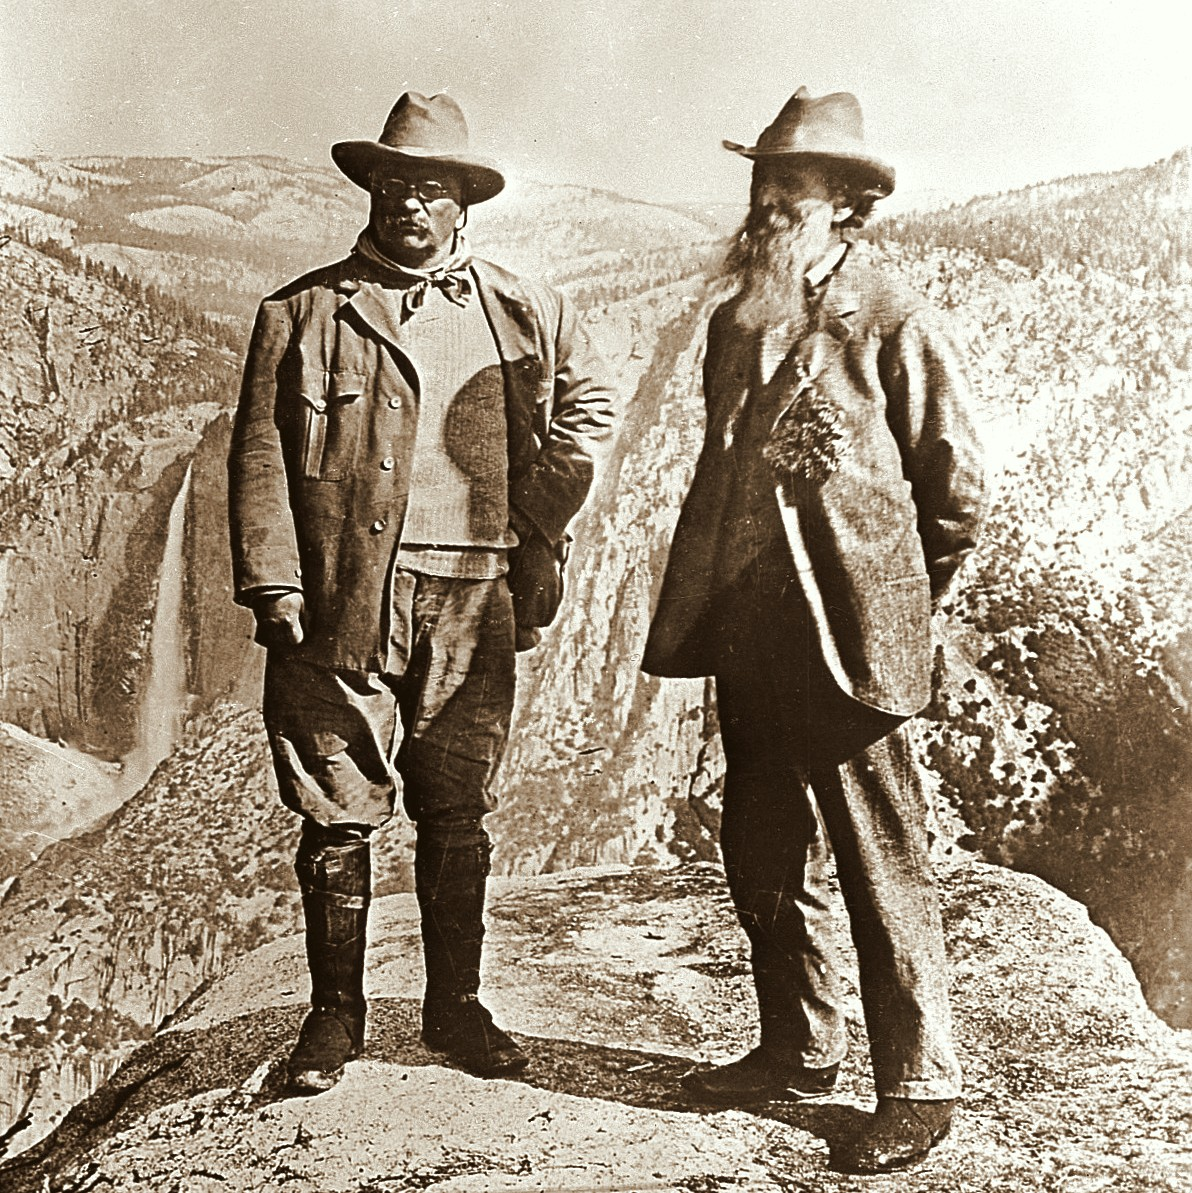 U.S. president Teddy Roosevelt and environmentalist John Muir, 1906